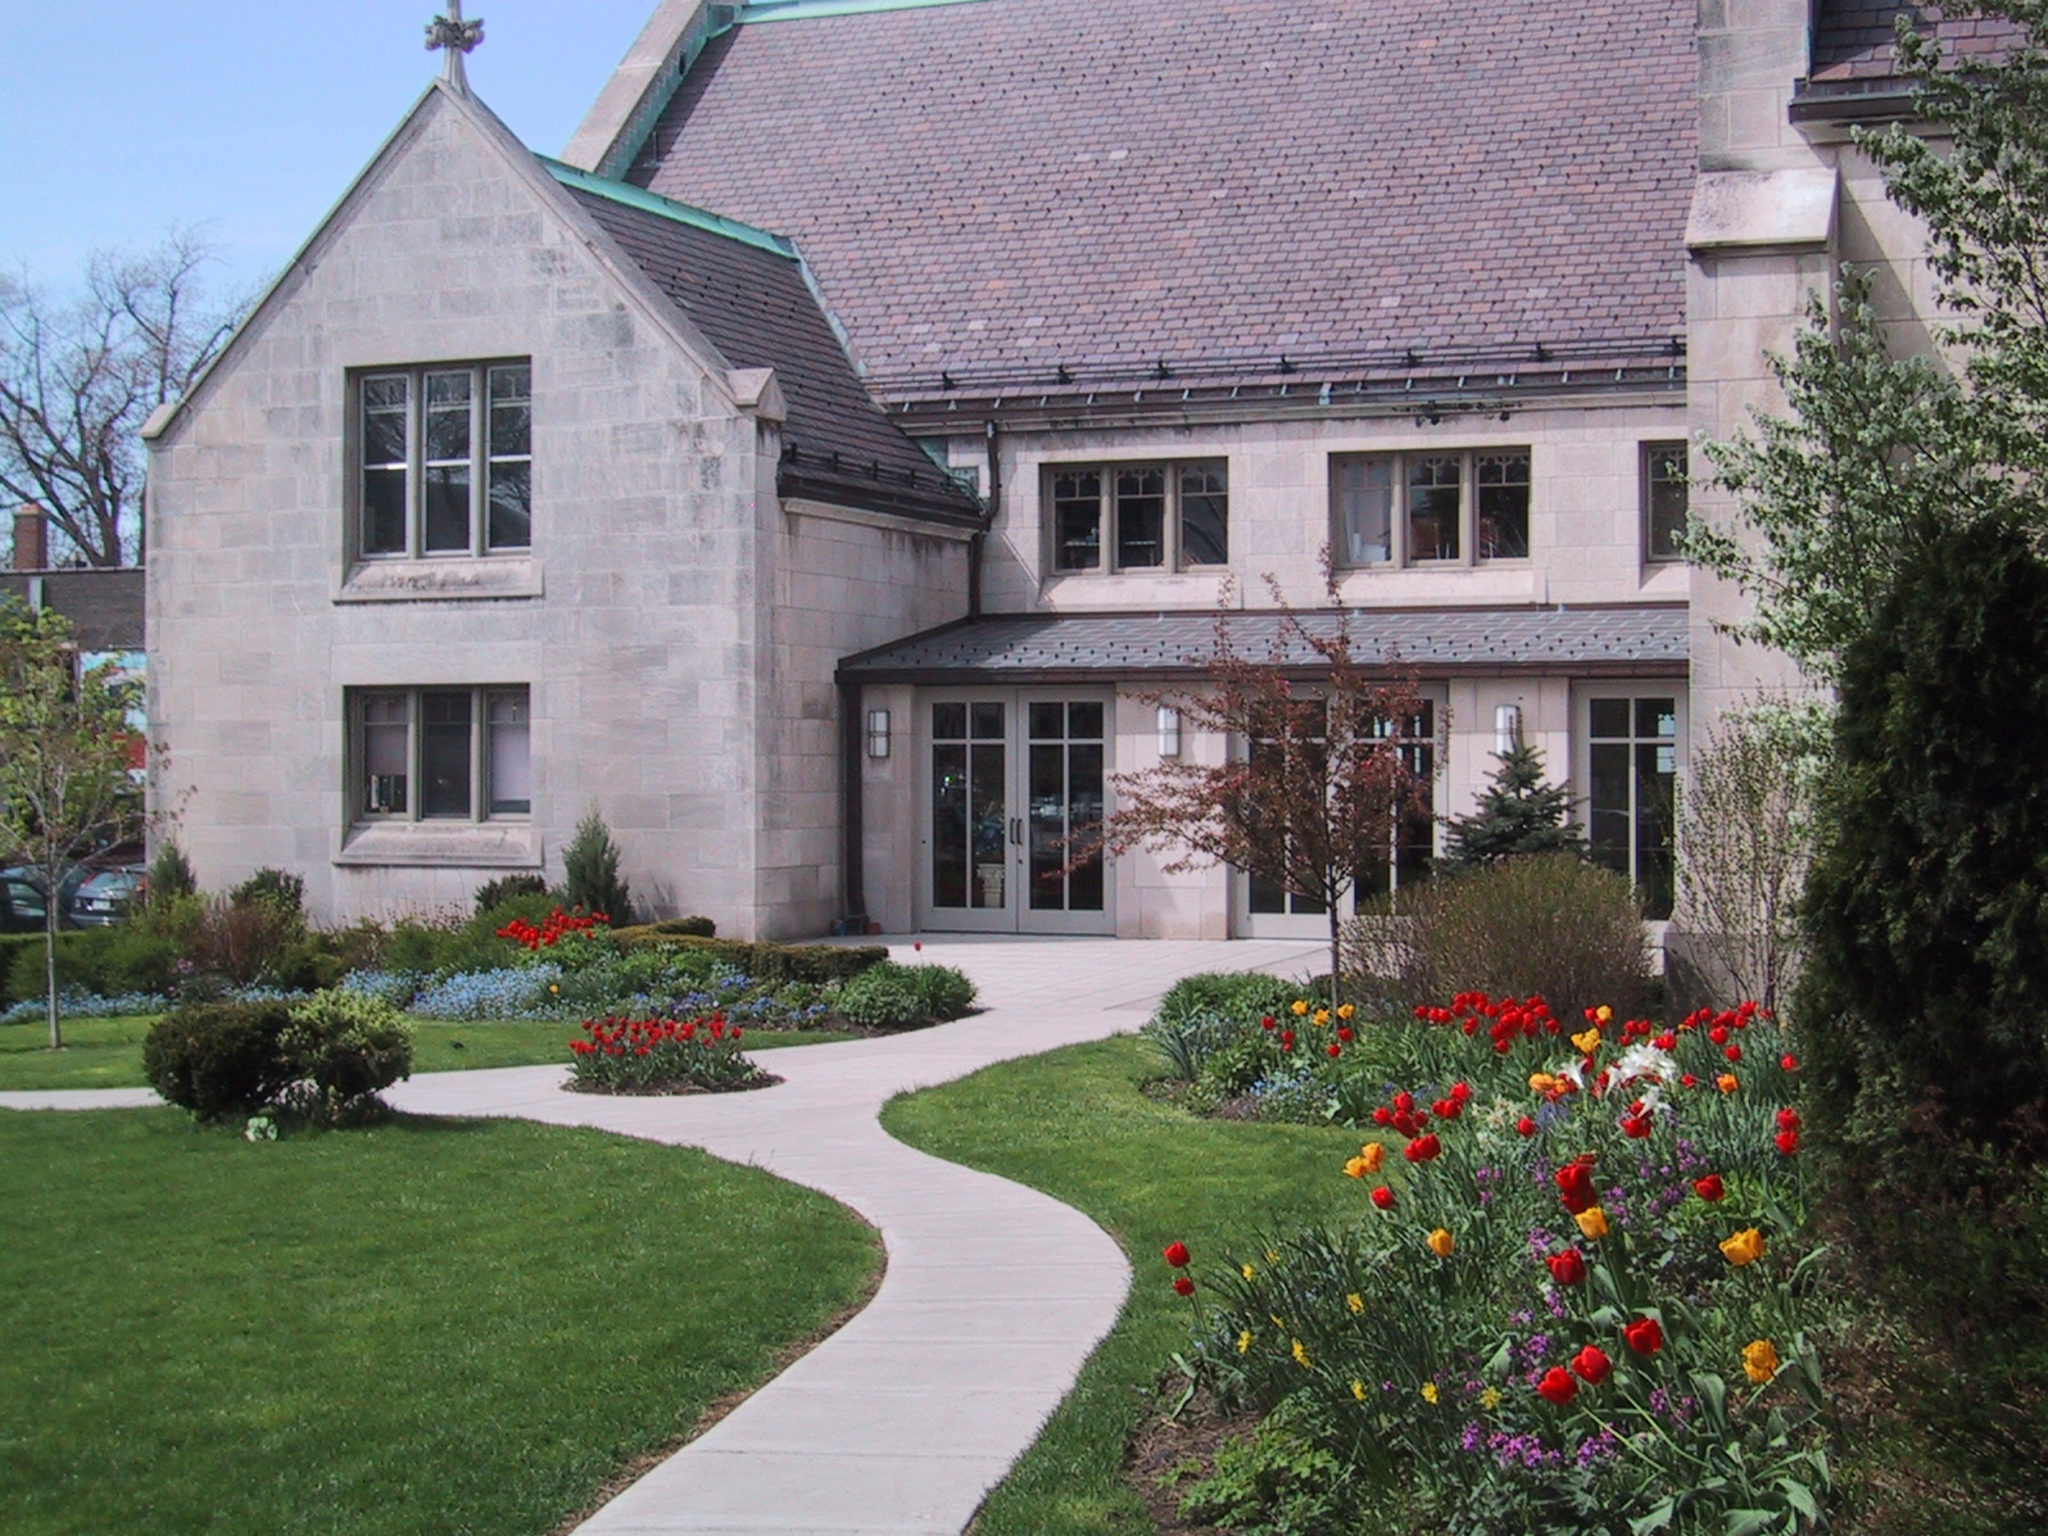 Home - Unitarian Universalist Church of Greensboro